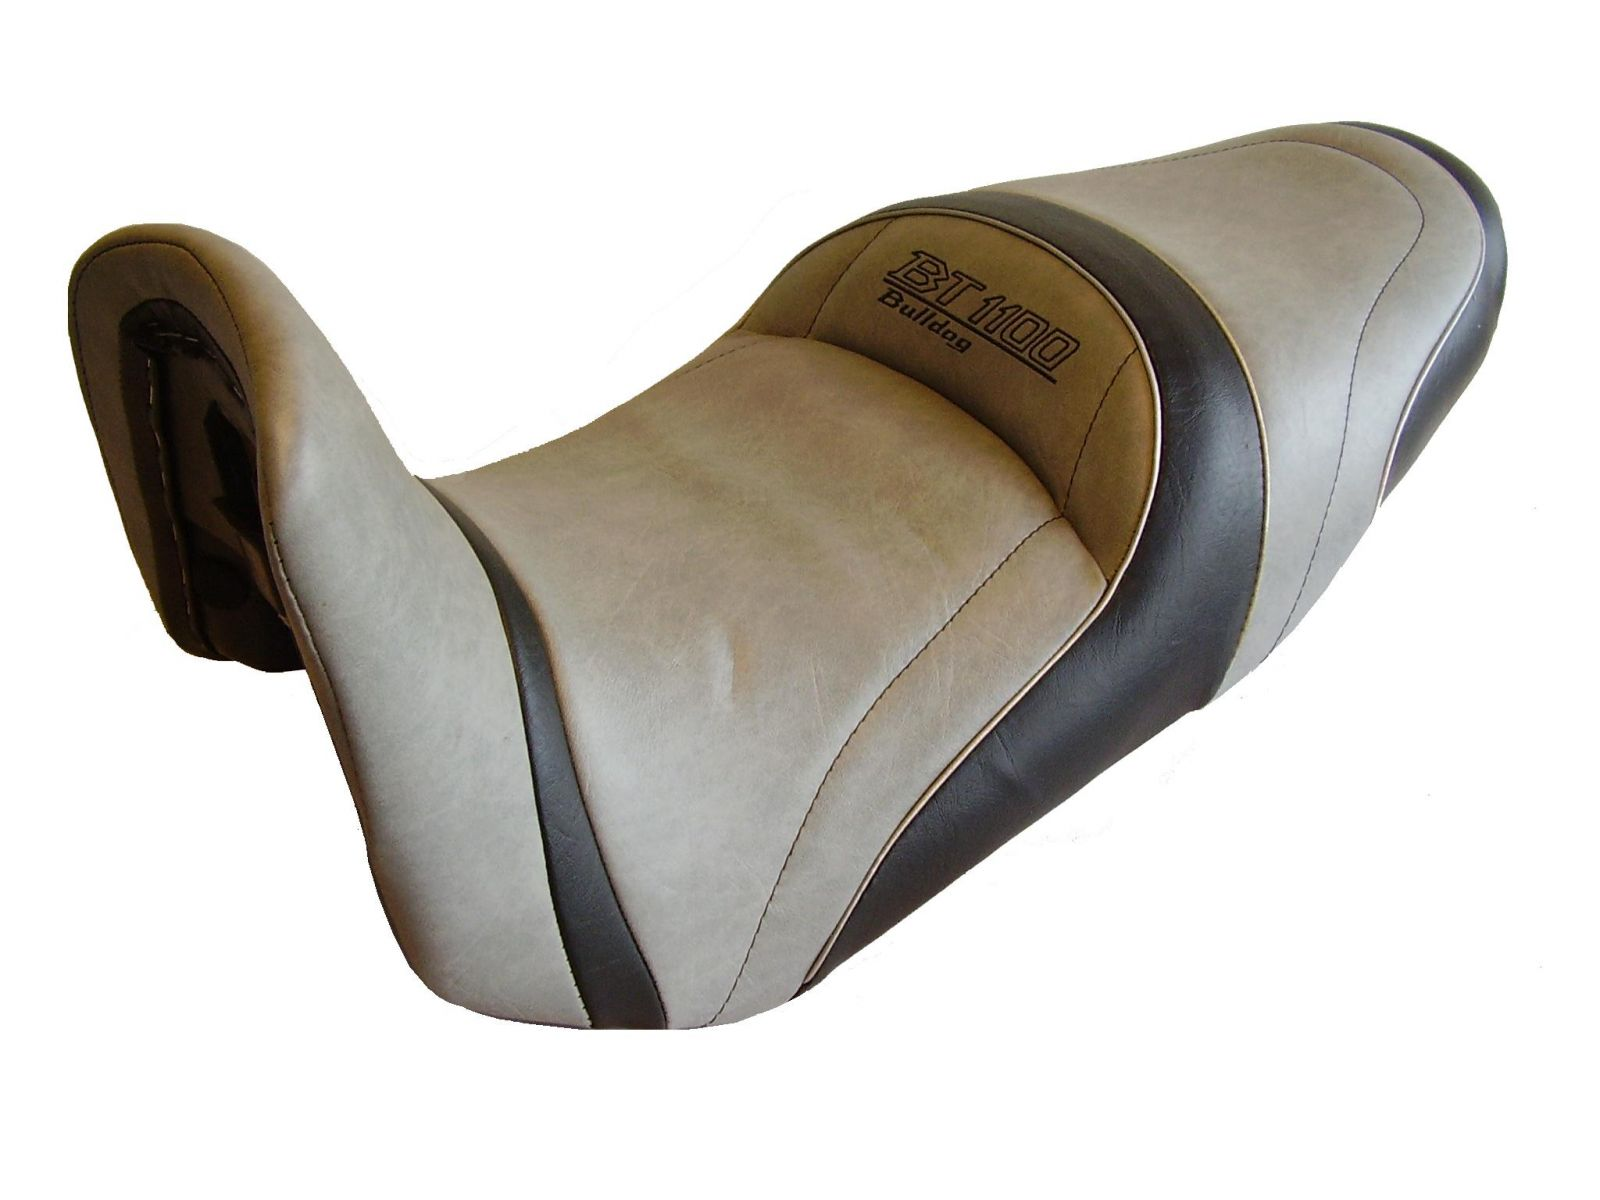 Deluxe seat SGC0973 - YAMAHA BULLDOG BT 1100 [2002-2006]